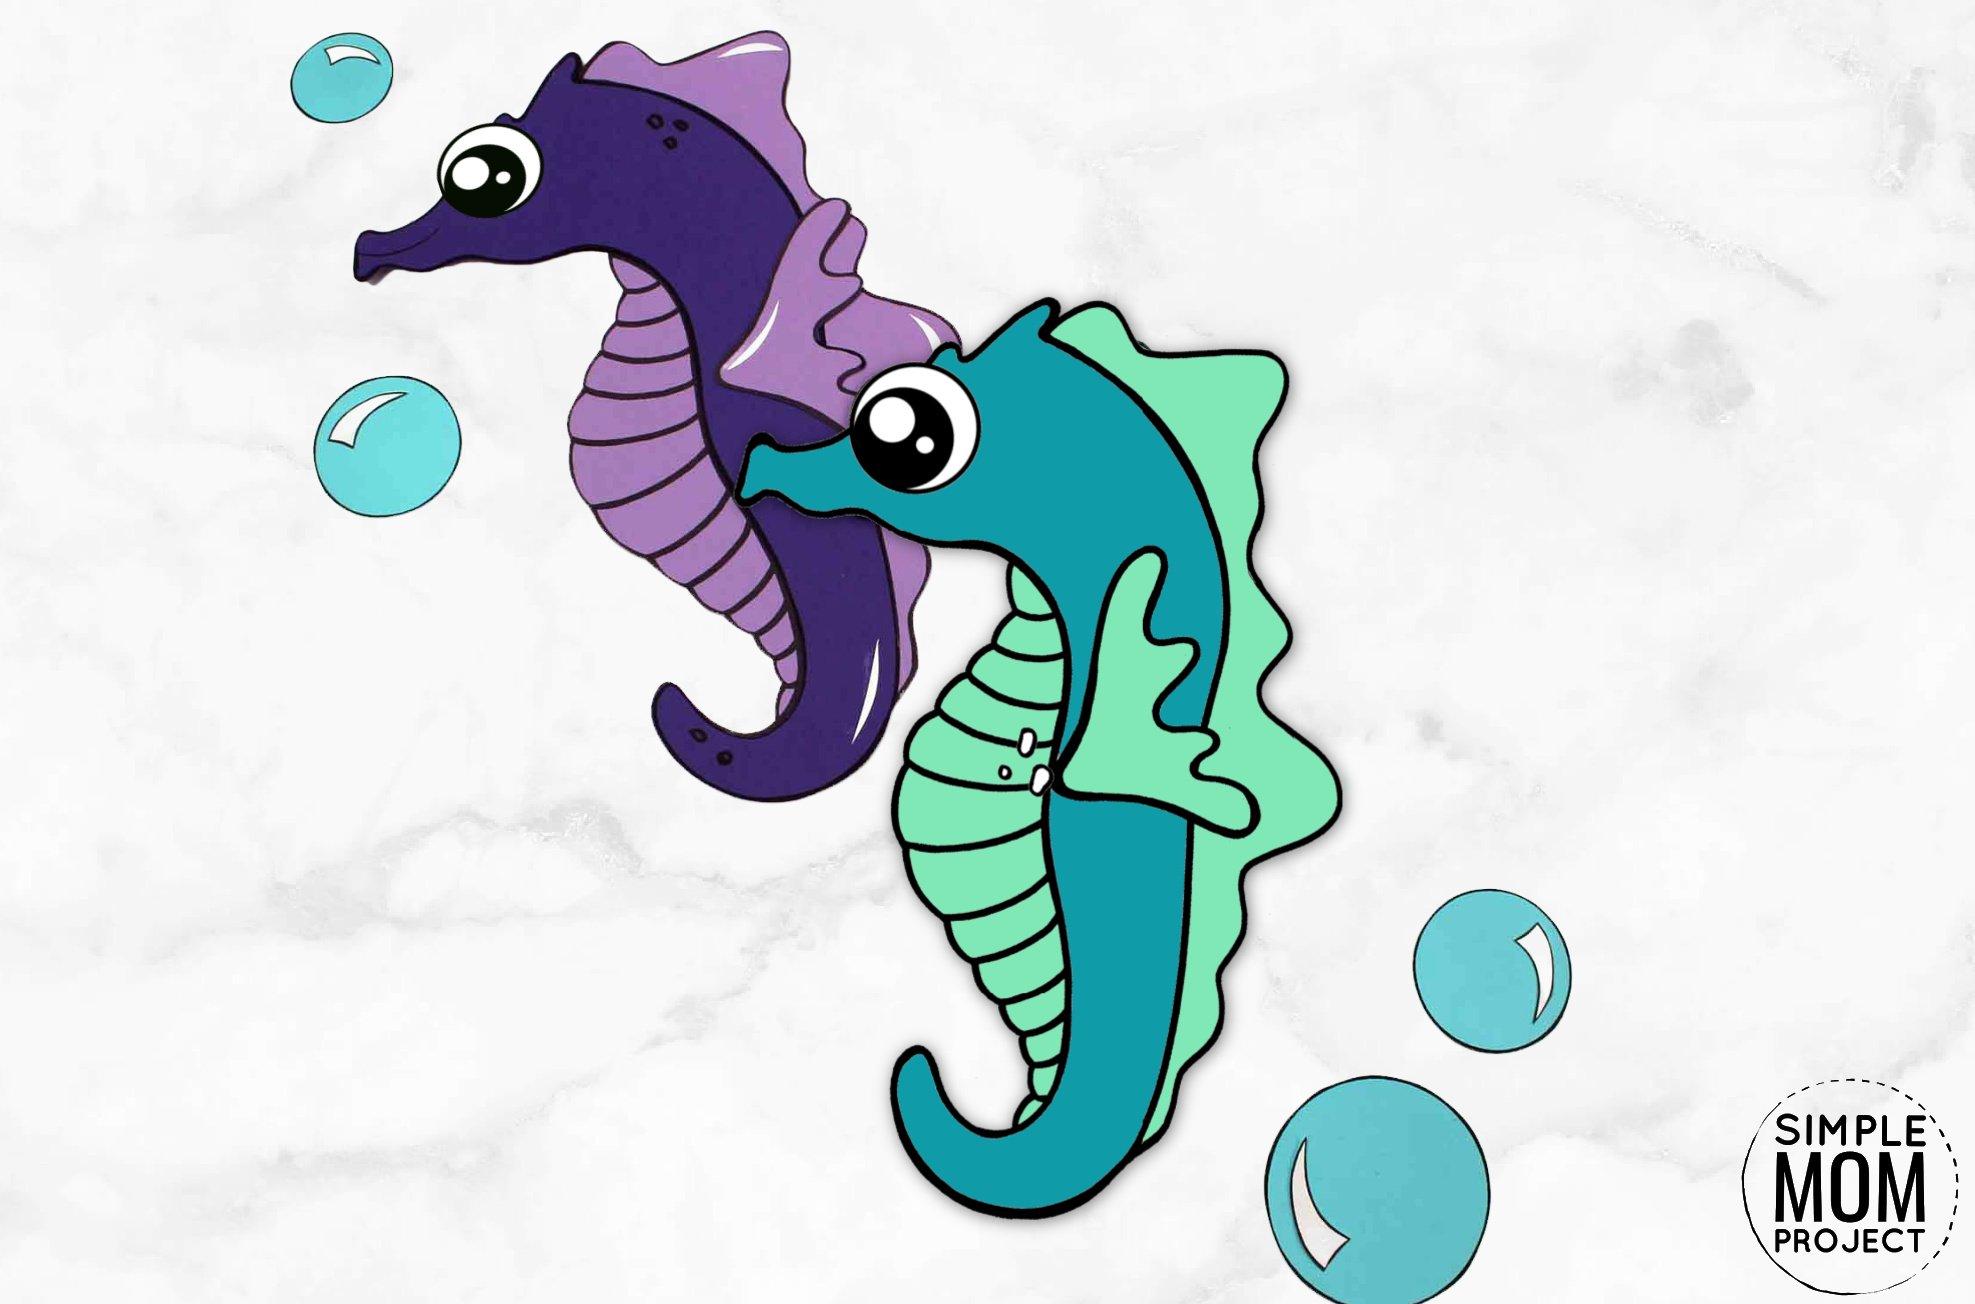 Free Printable Seahorse Ocean Animal Craft for Kids, preschoolers and toddlers